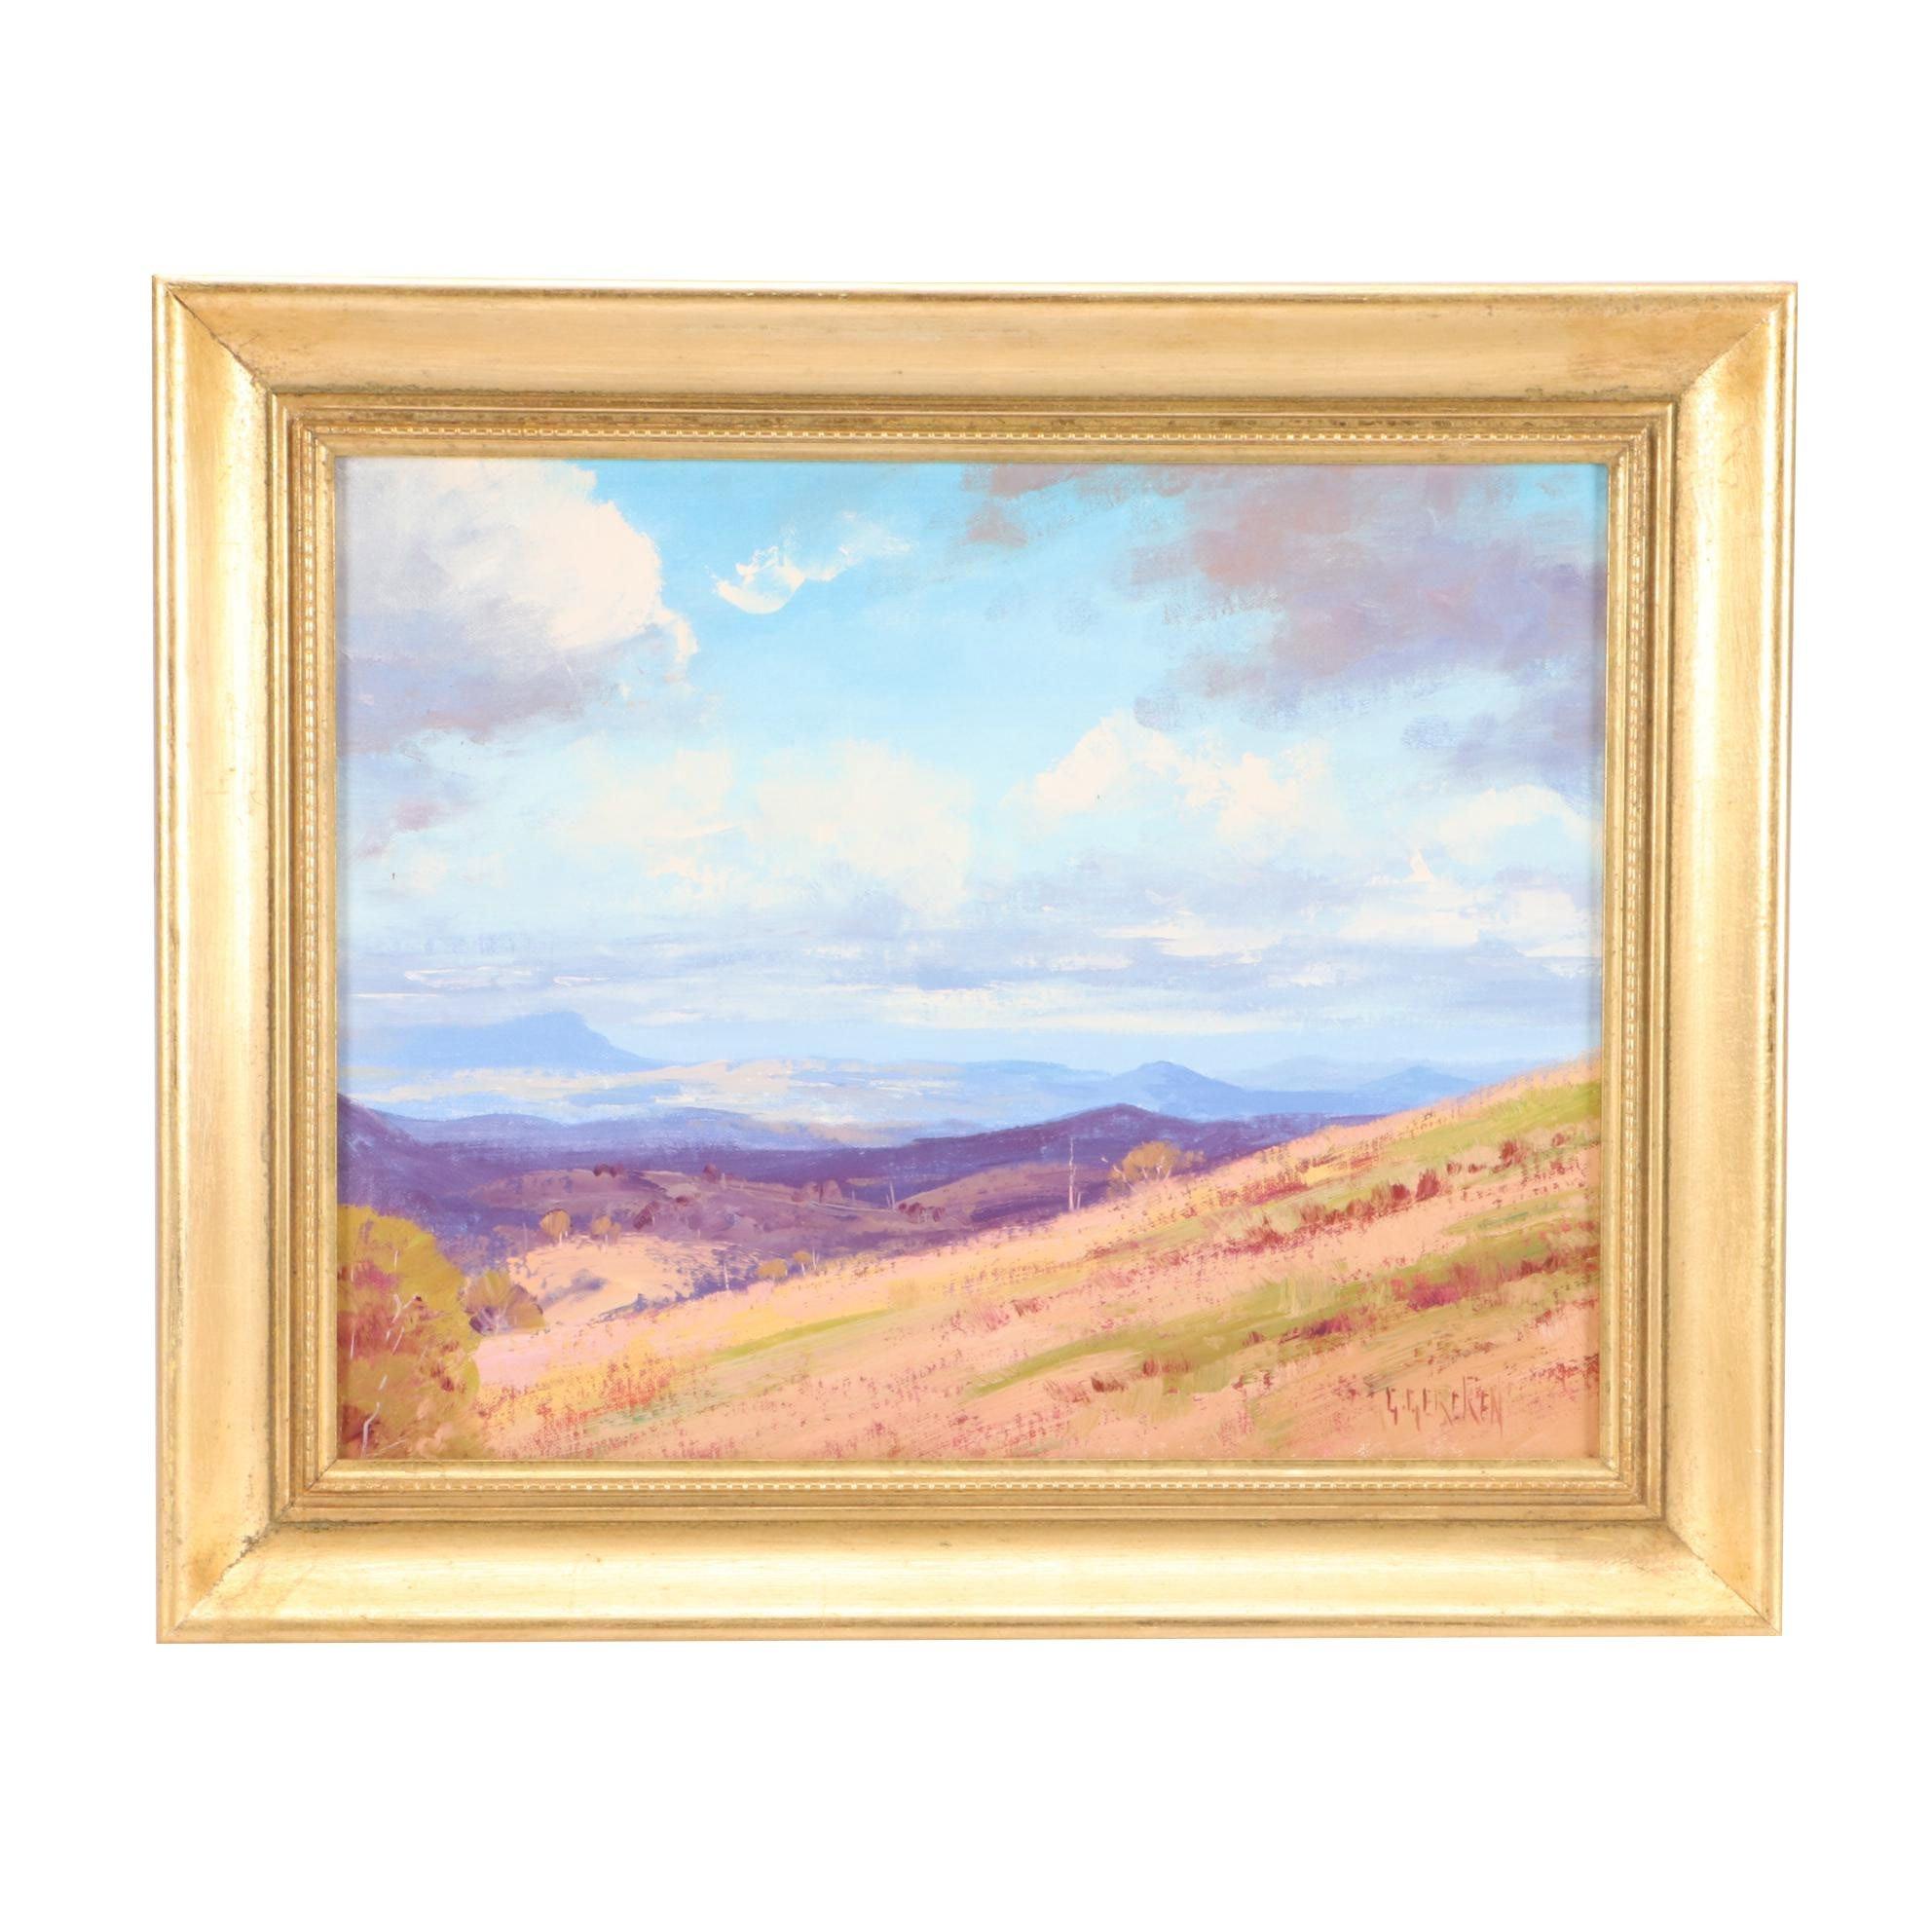 Graham Gercken Oil Landscape Painting